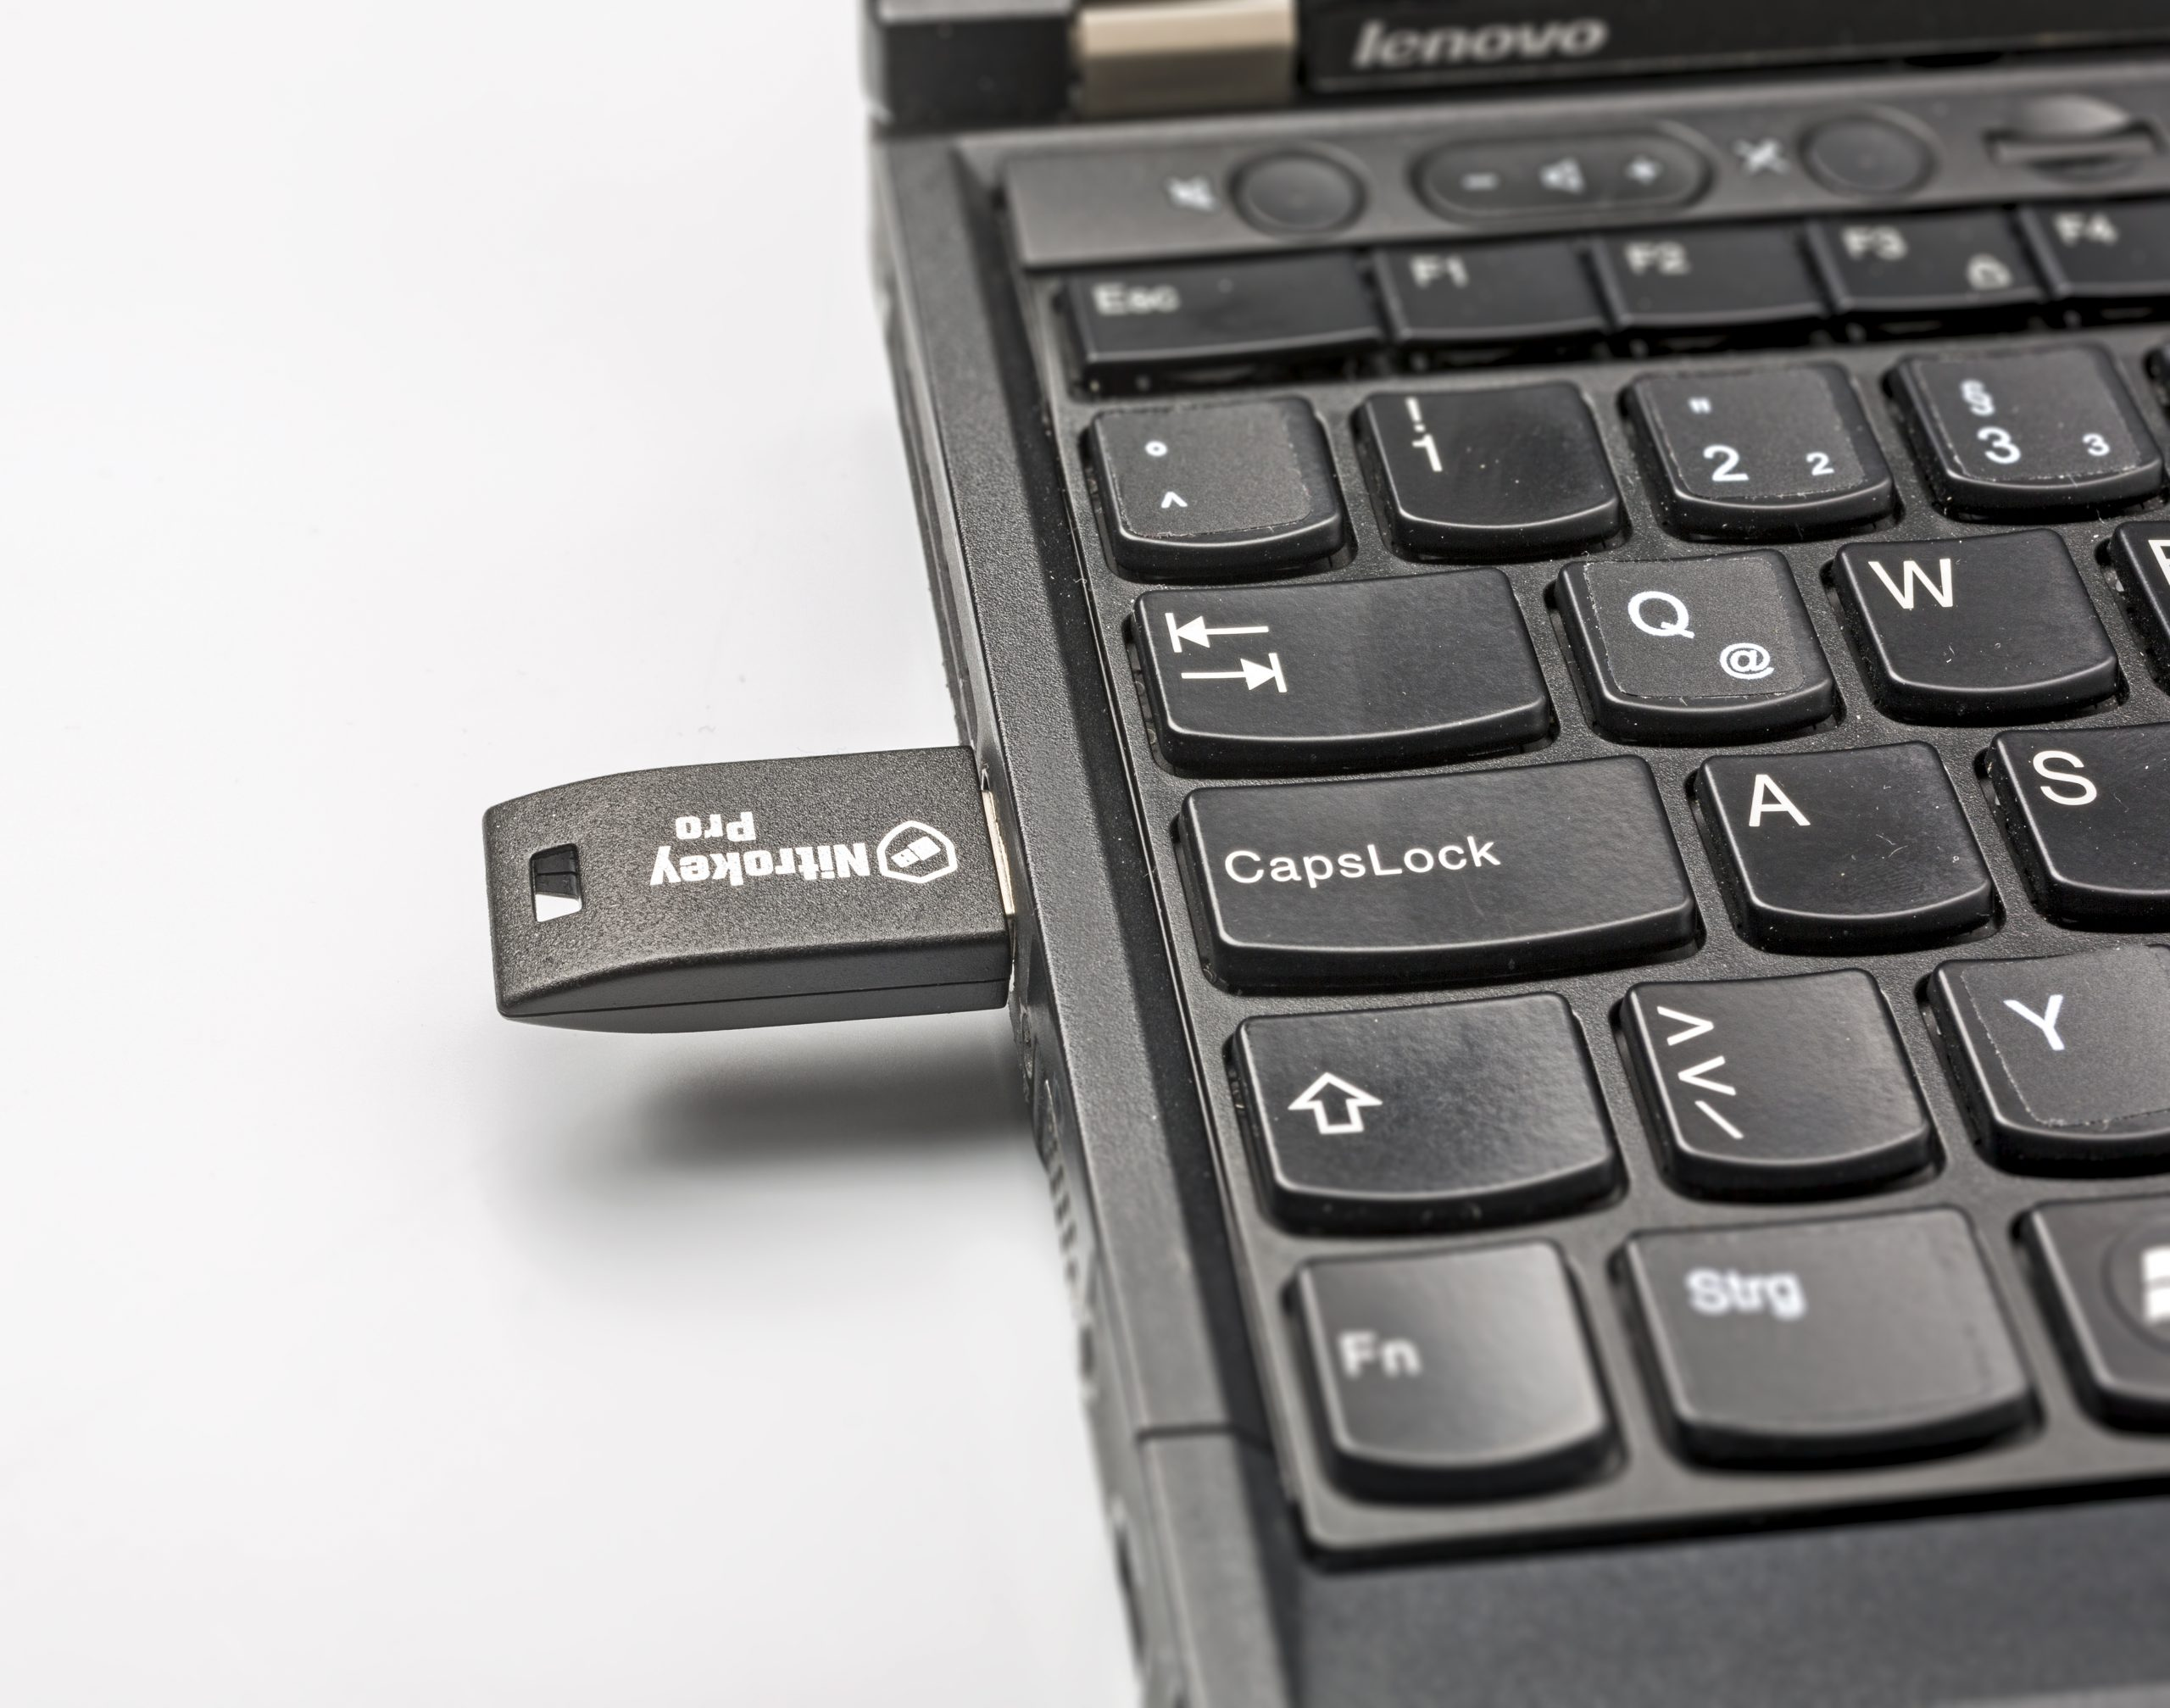 Nitrokey Nitropad usb-stick controleert opstartcode